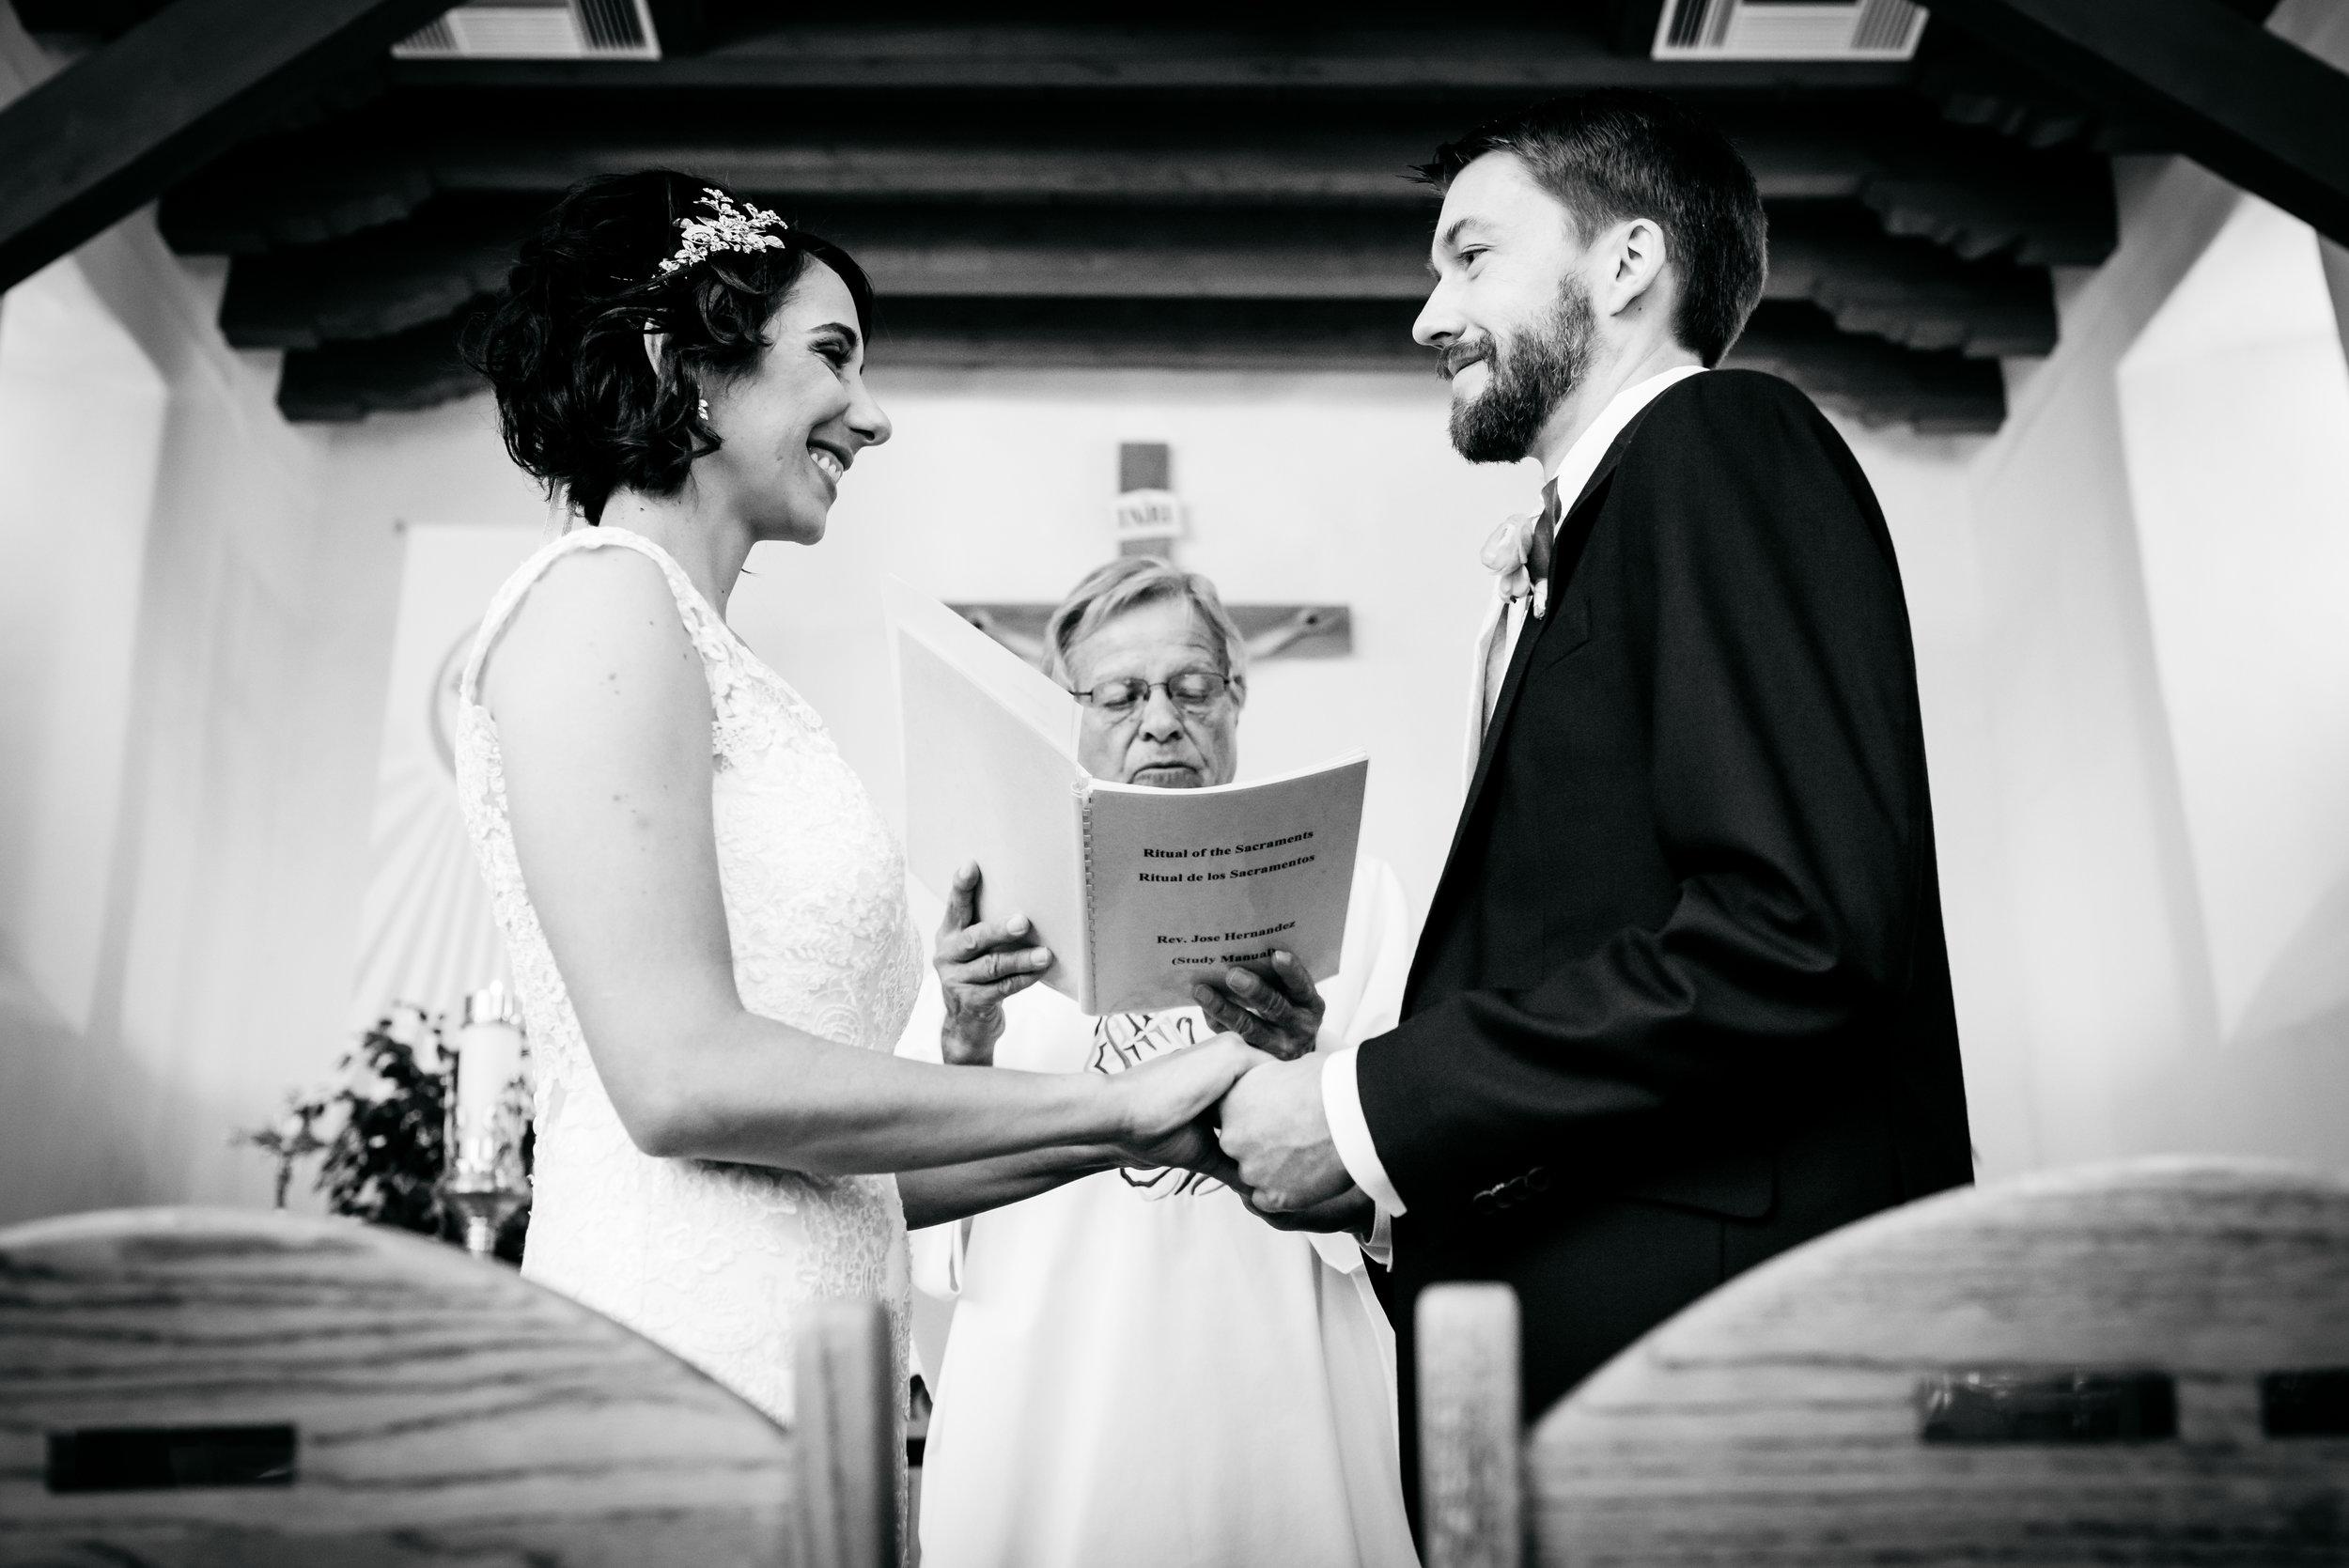 Extended_Play_Photography_Carmella_Wedding-10.jpg